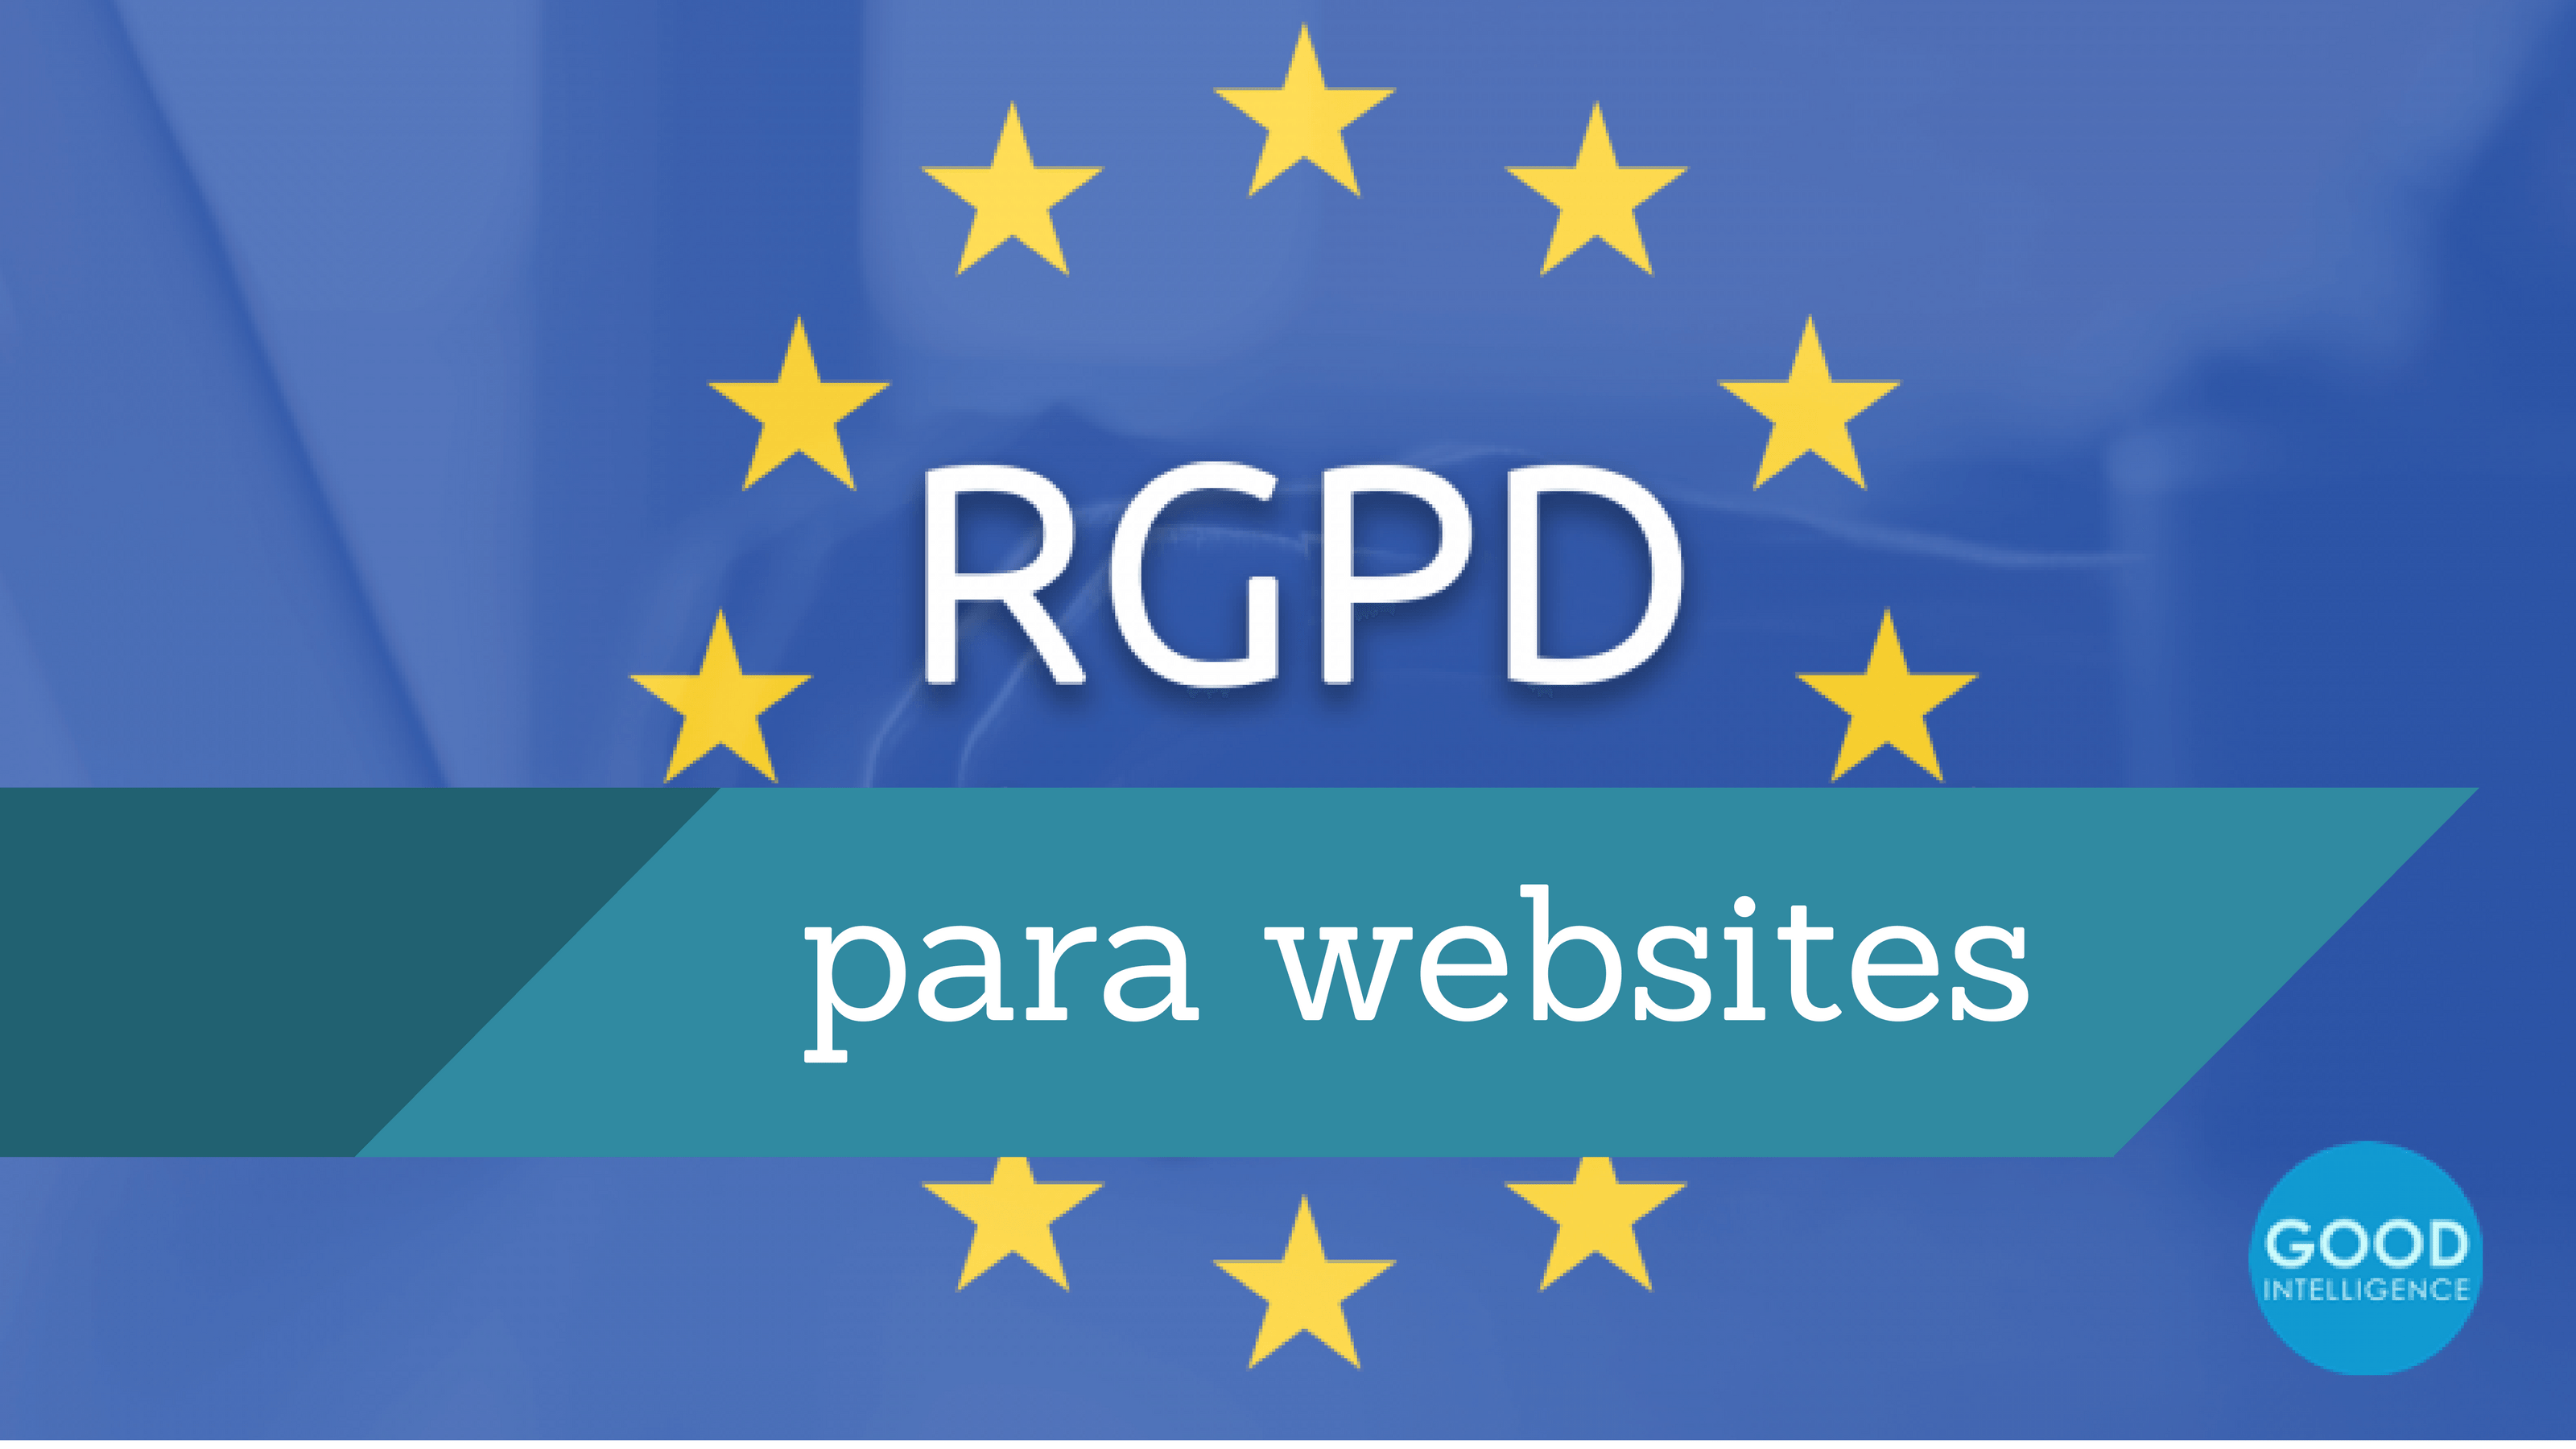 rgpd para websites